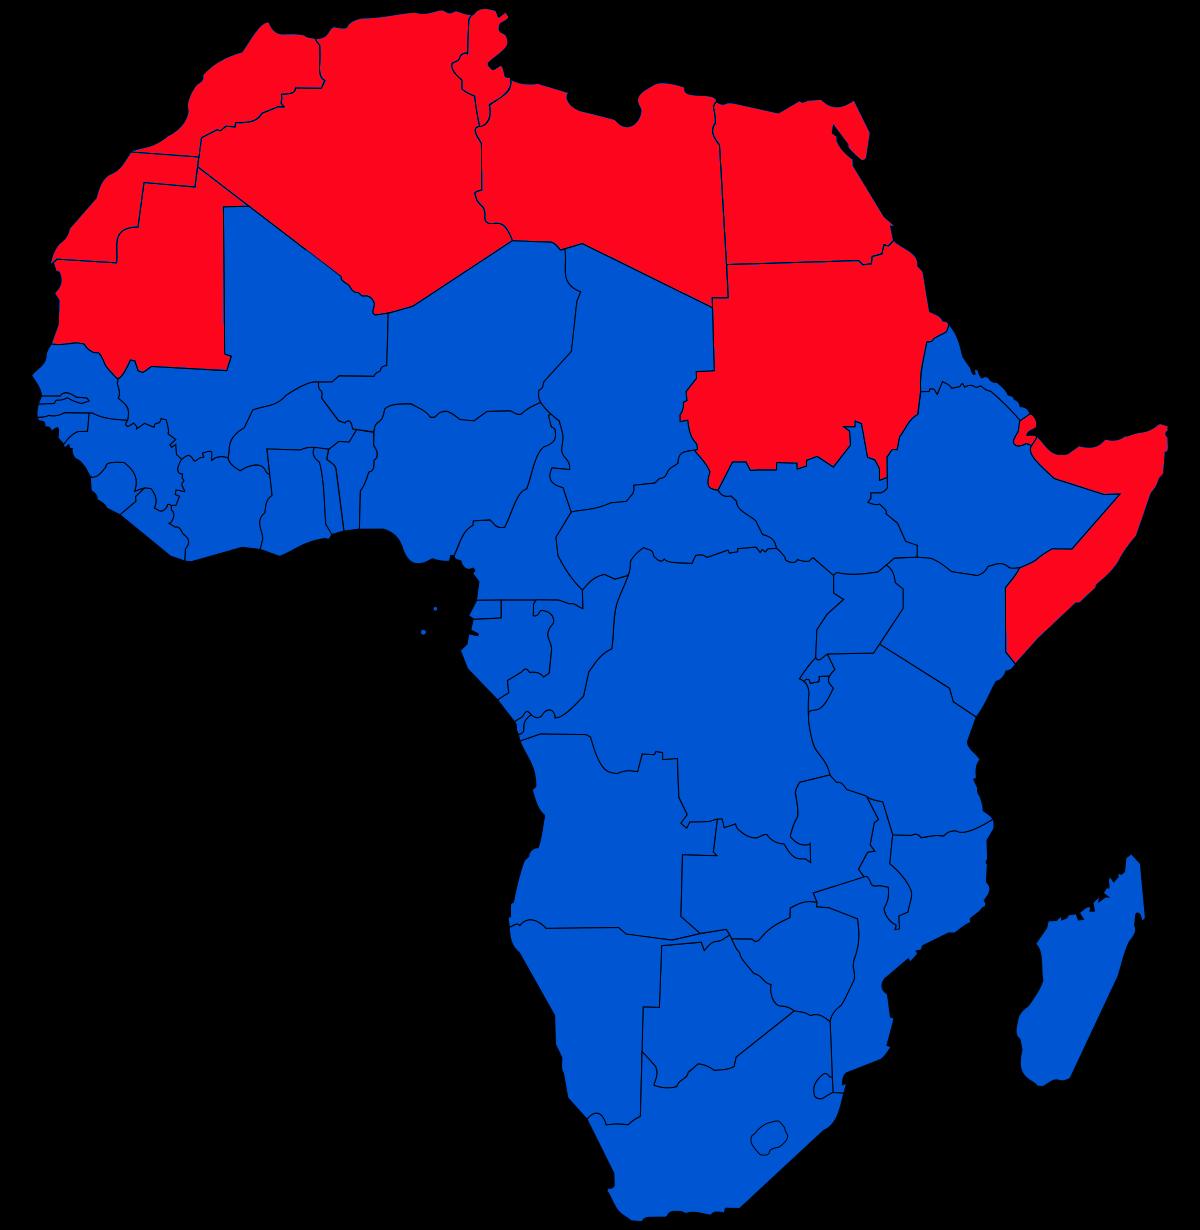 Africa_map (1)